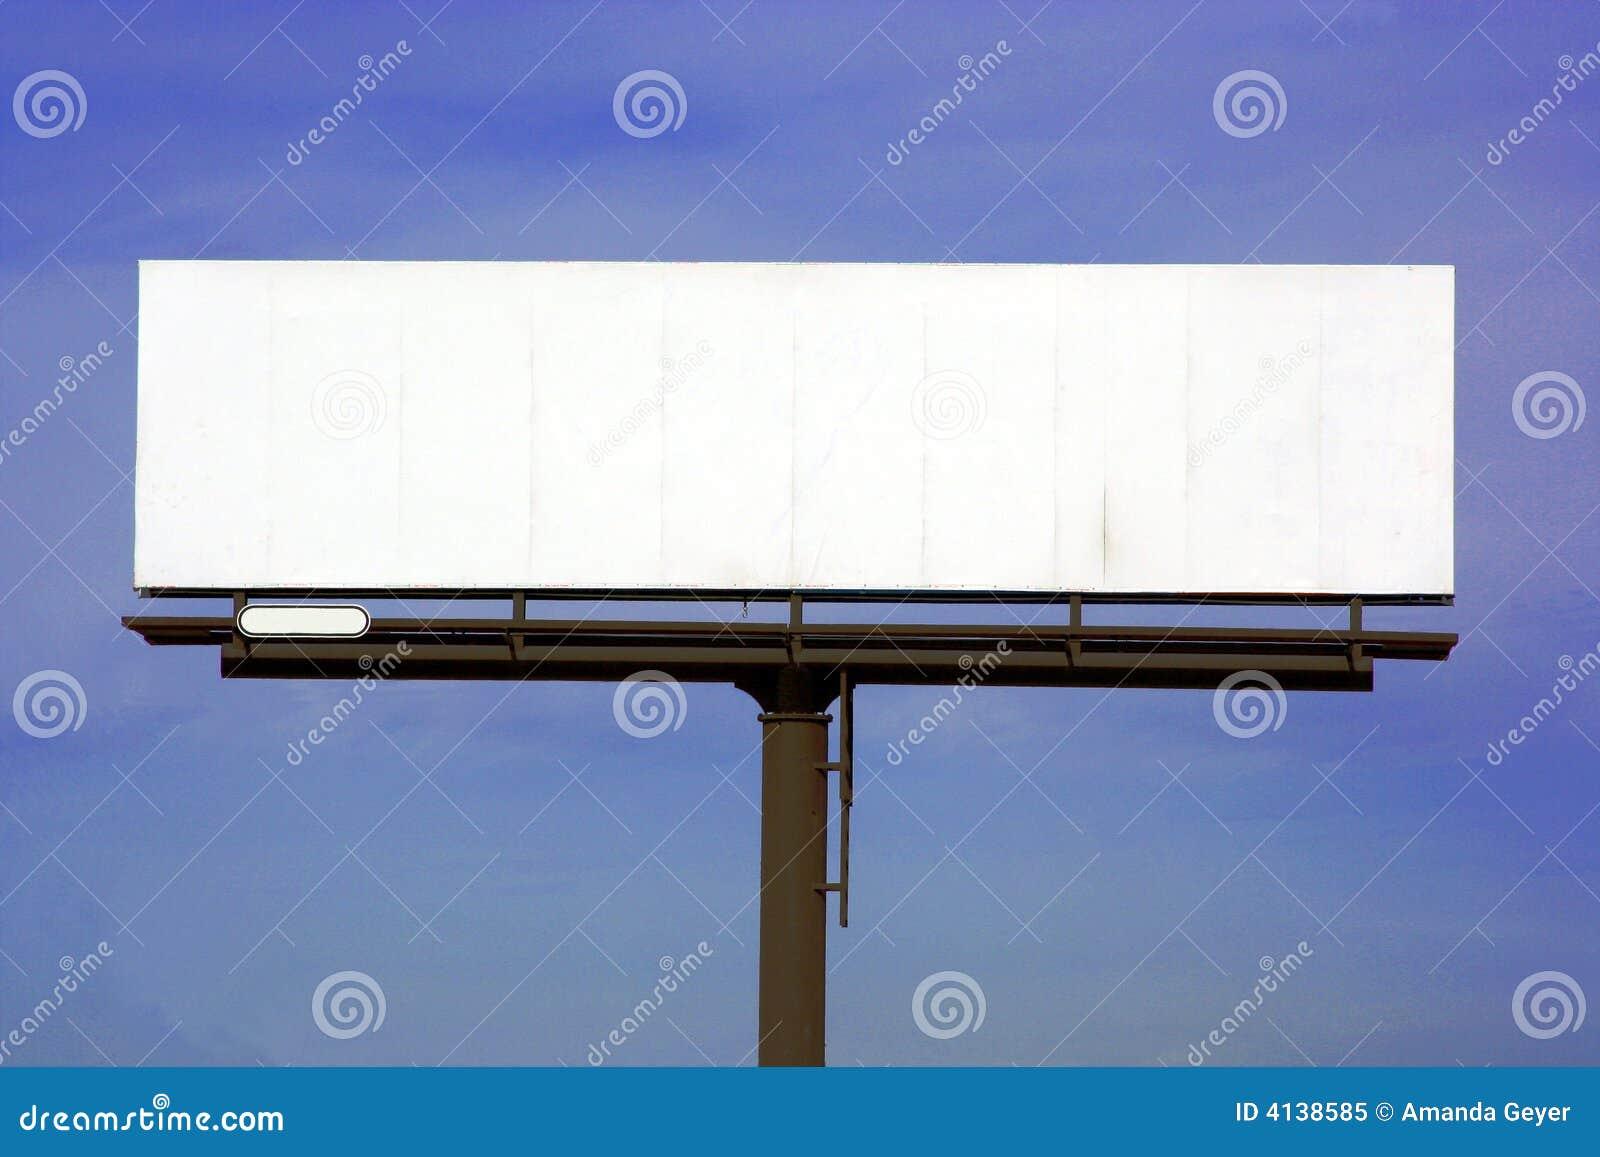 Blank Highway billboard